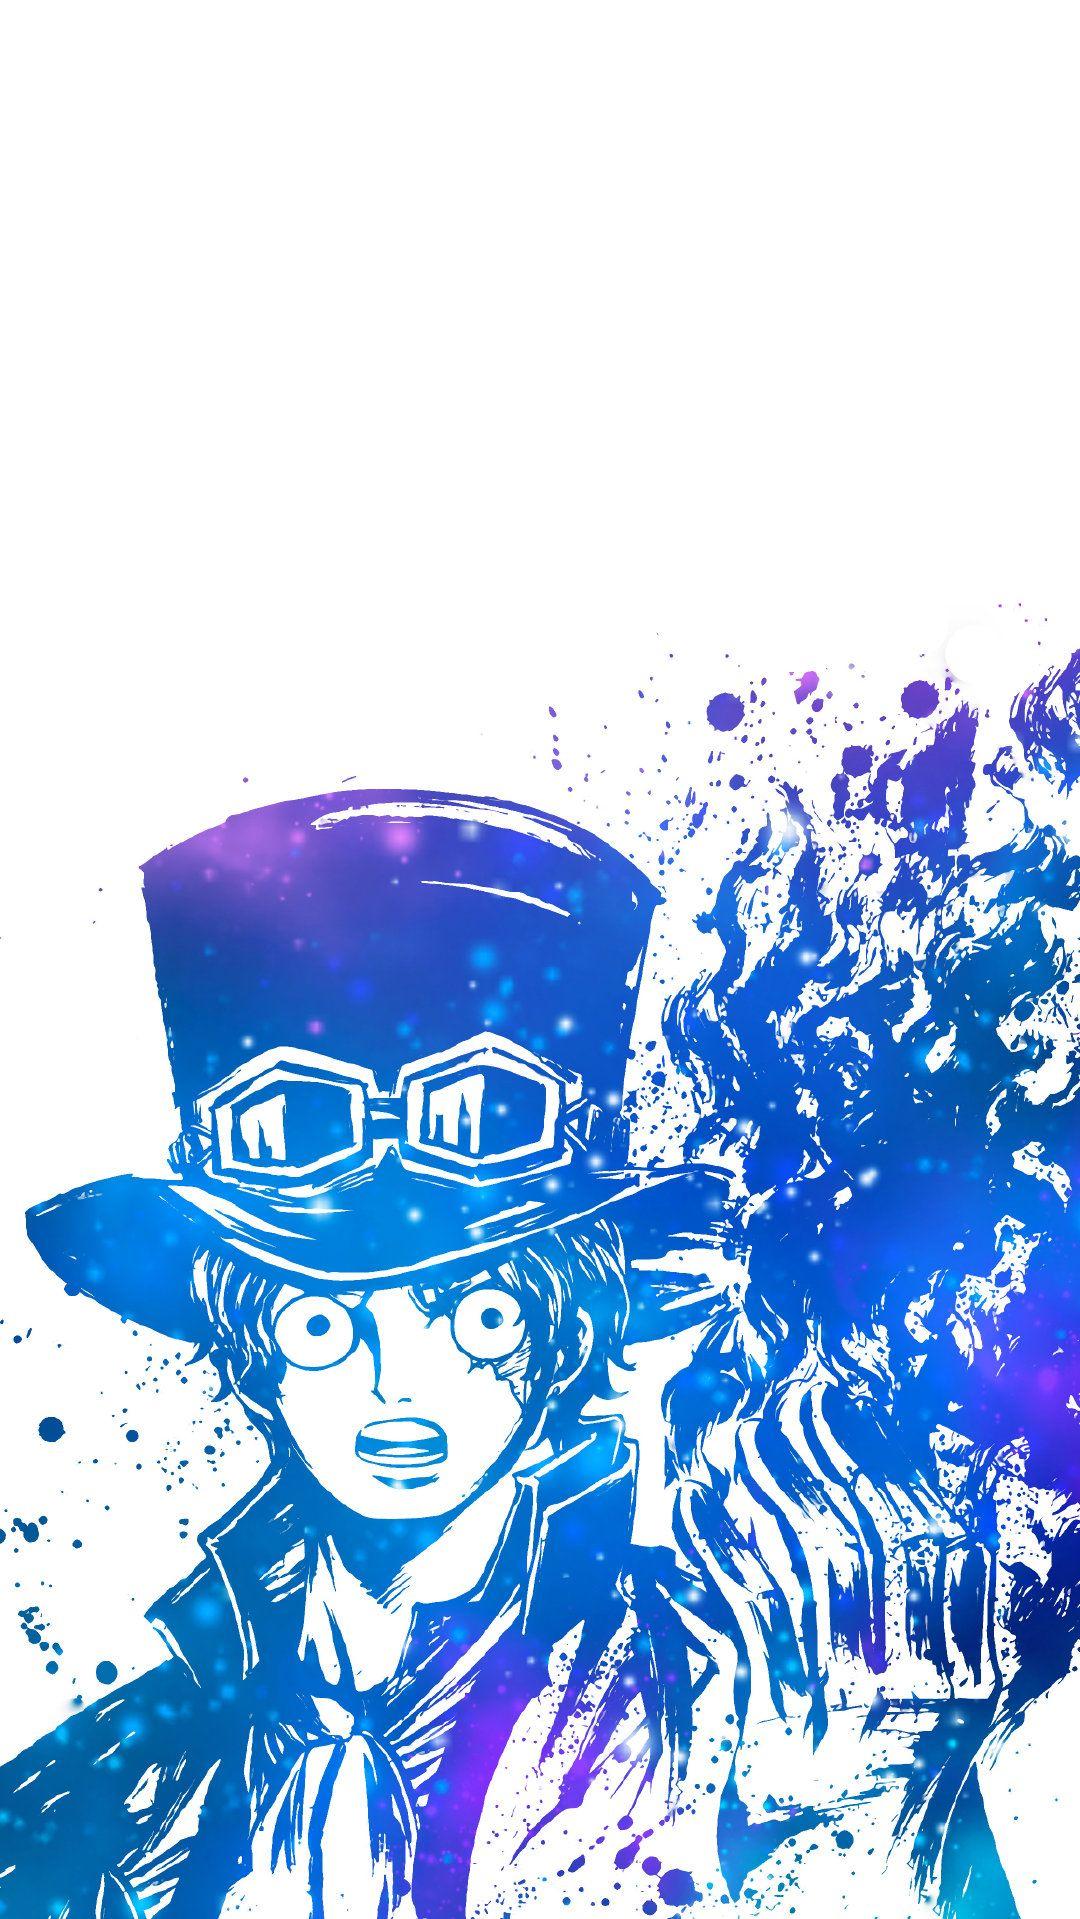 Onepiece イラスト One Piece の画像 投稿者 Jena Sue さん